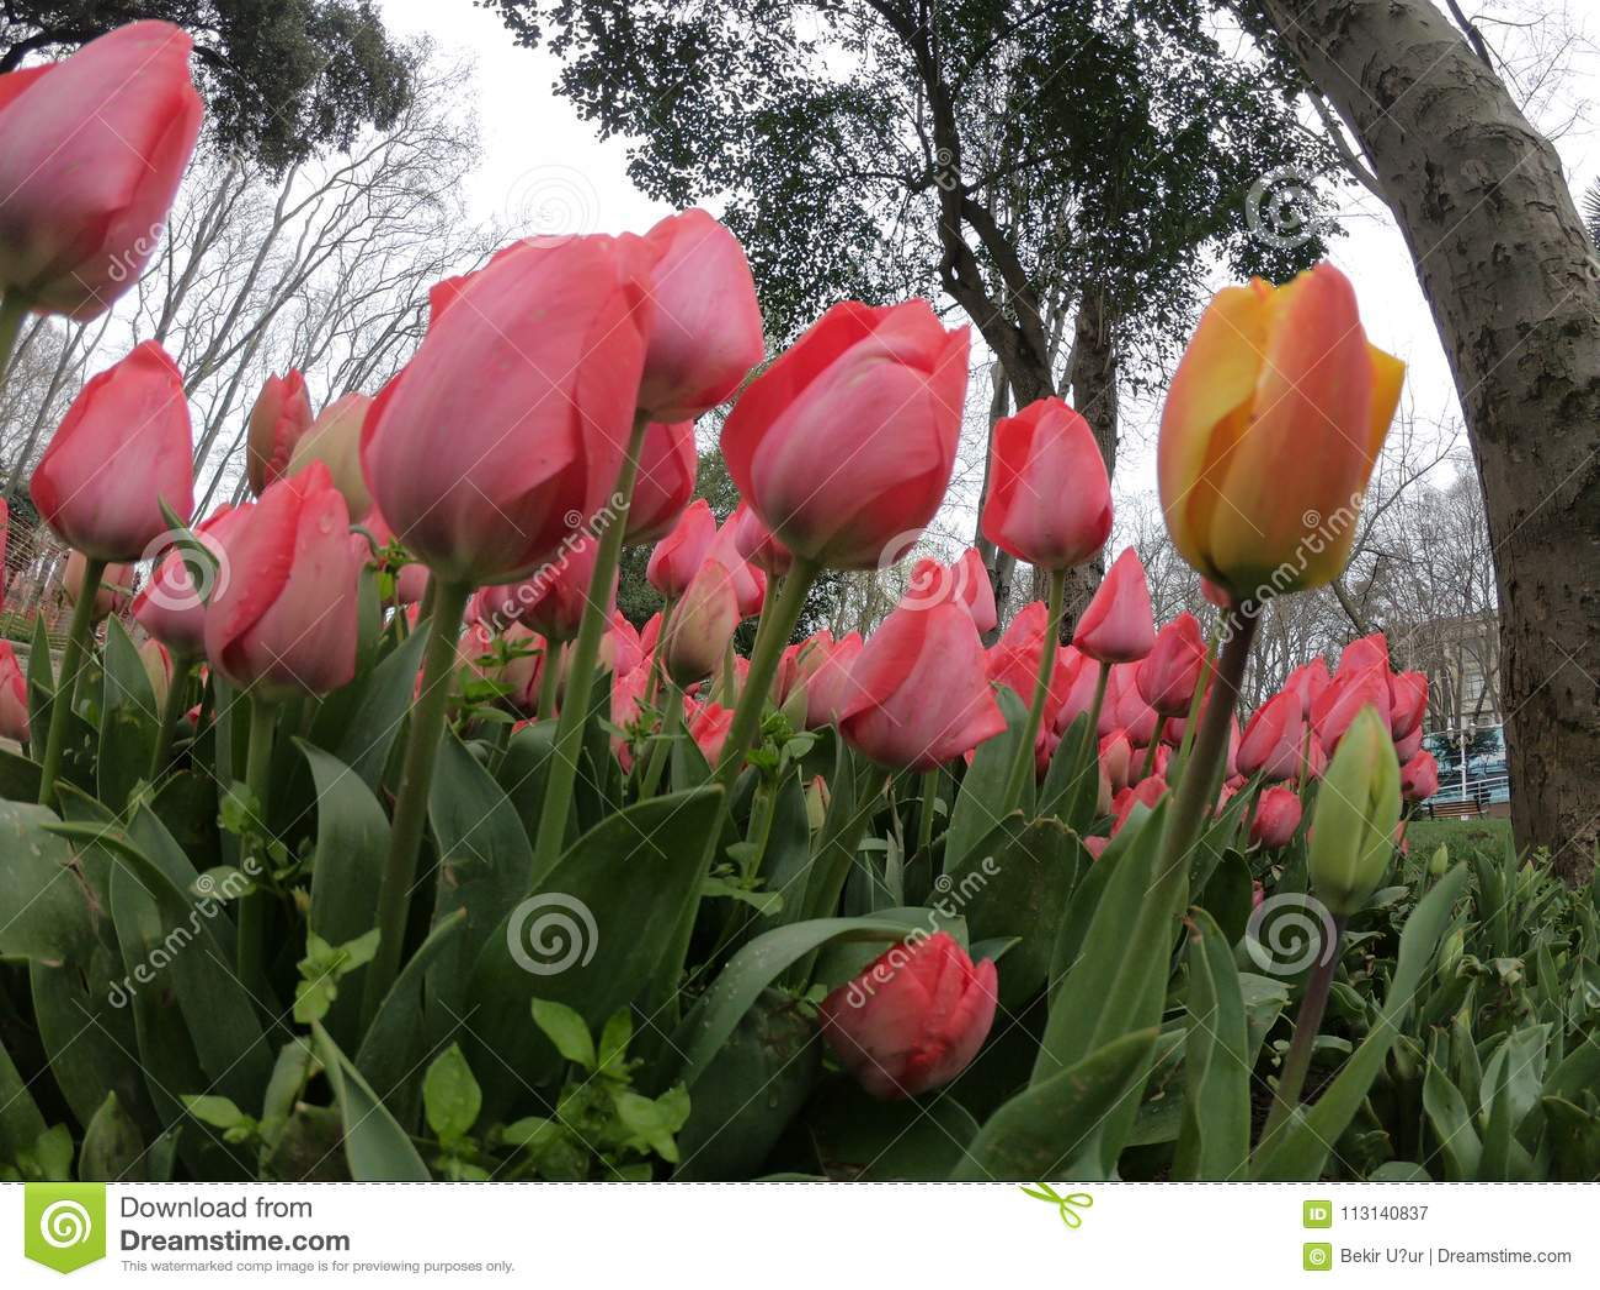 Tulips in Full Bloom -Cincinnati Zoo - YouTube